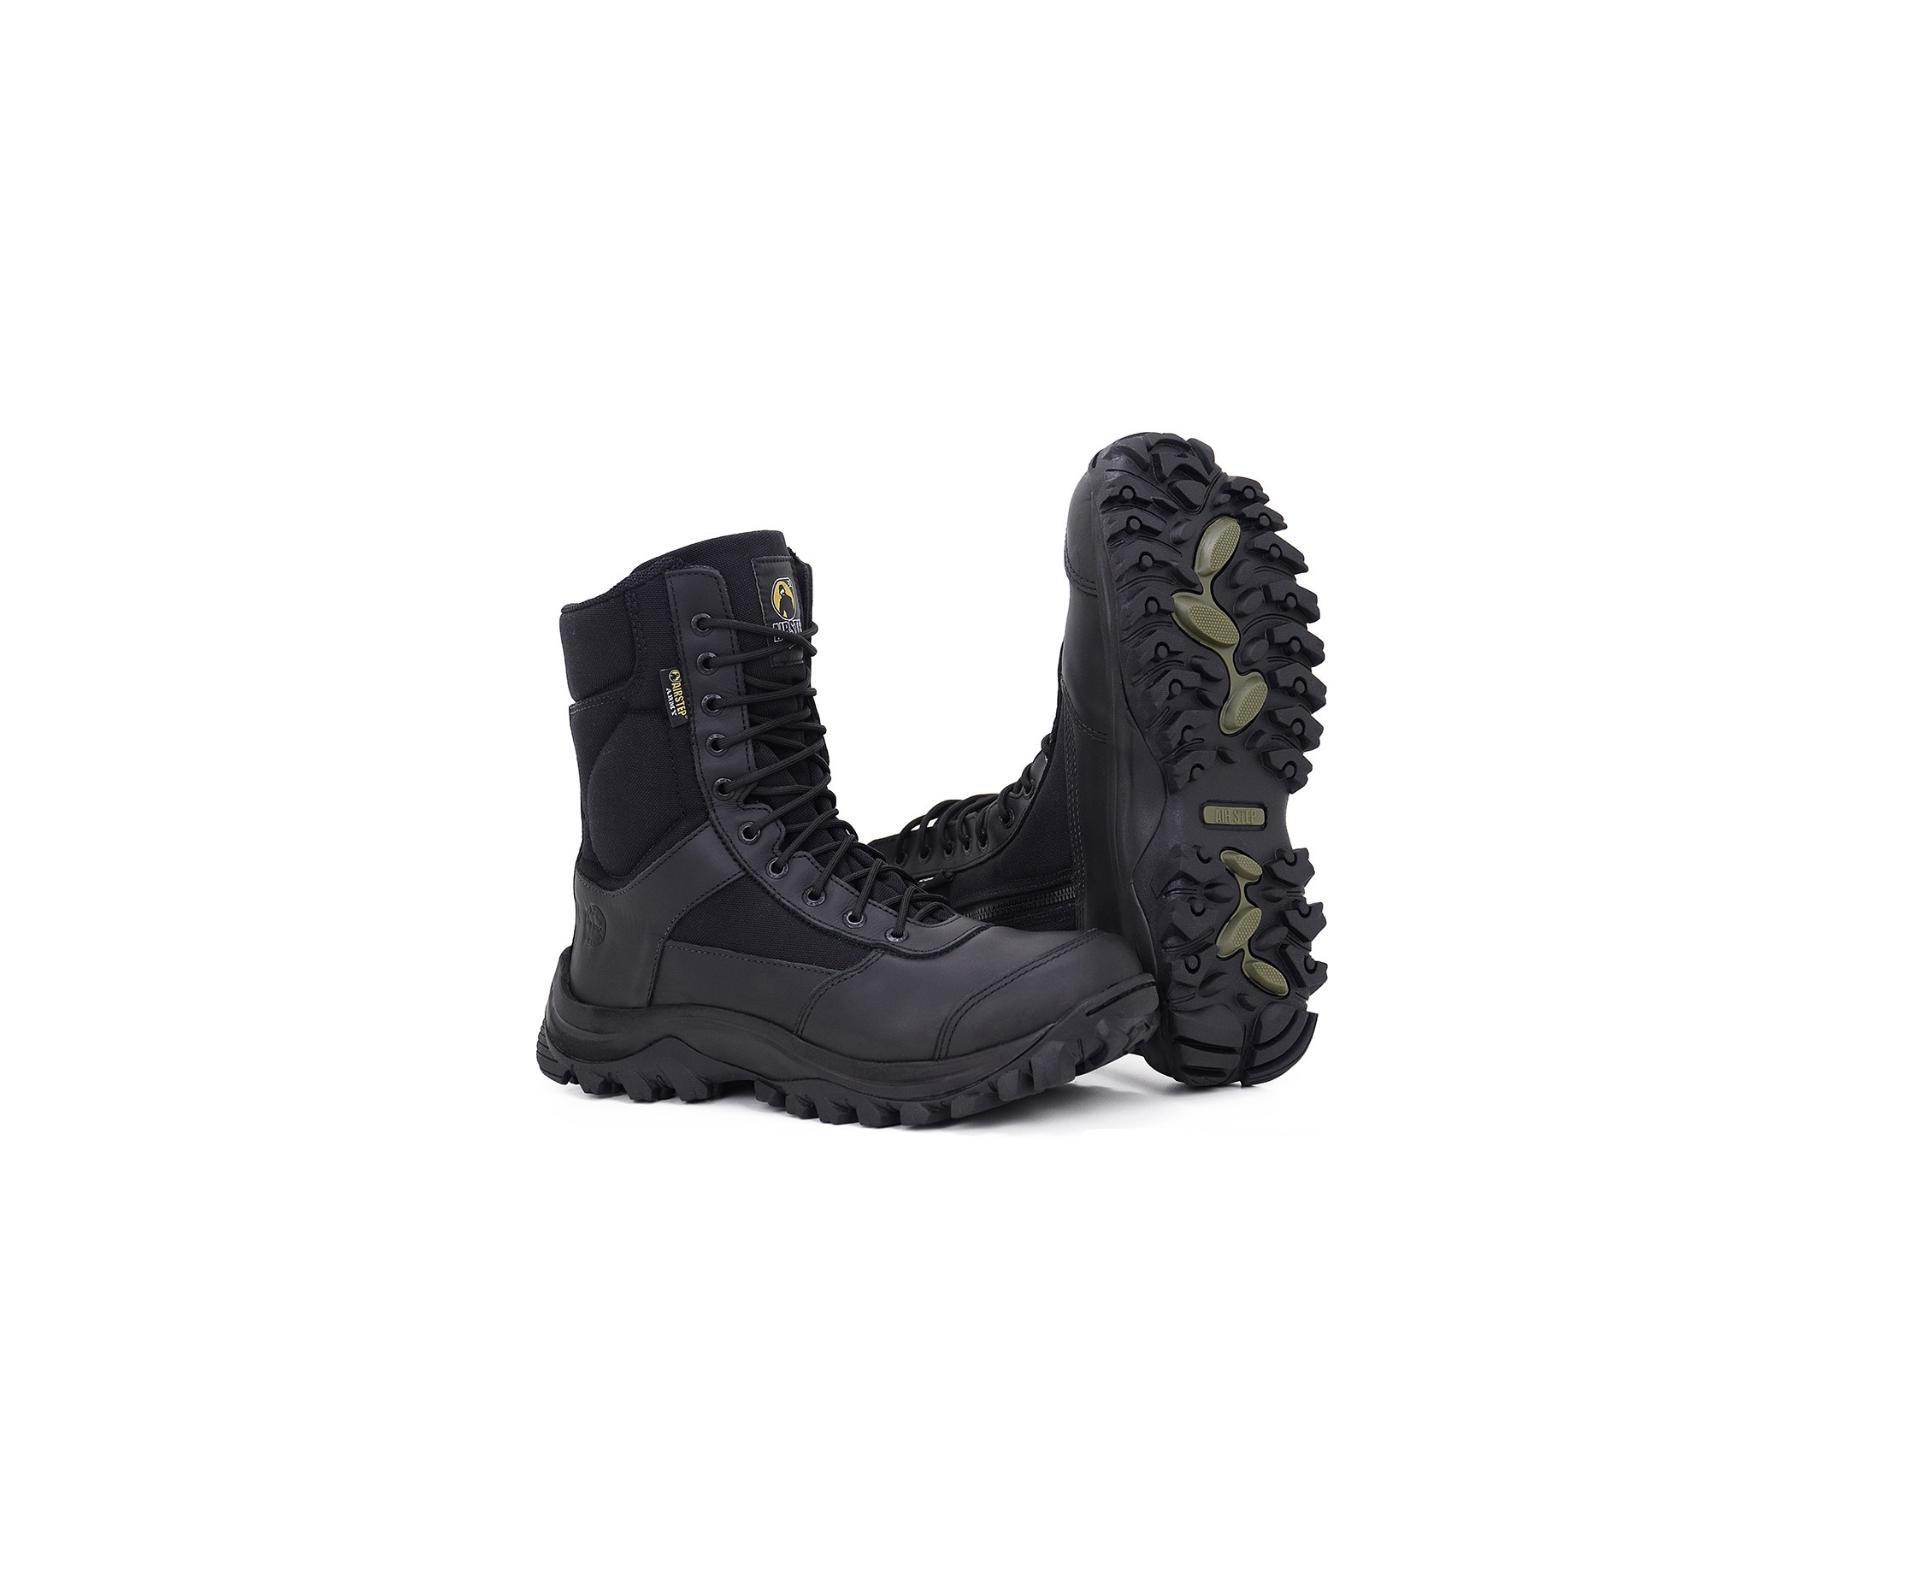 Coturno Bota Tático Airstep Easy Boot Light 8628 Preta